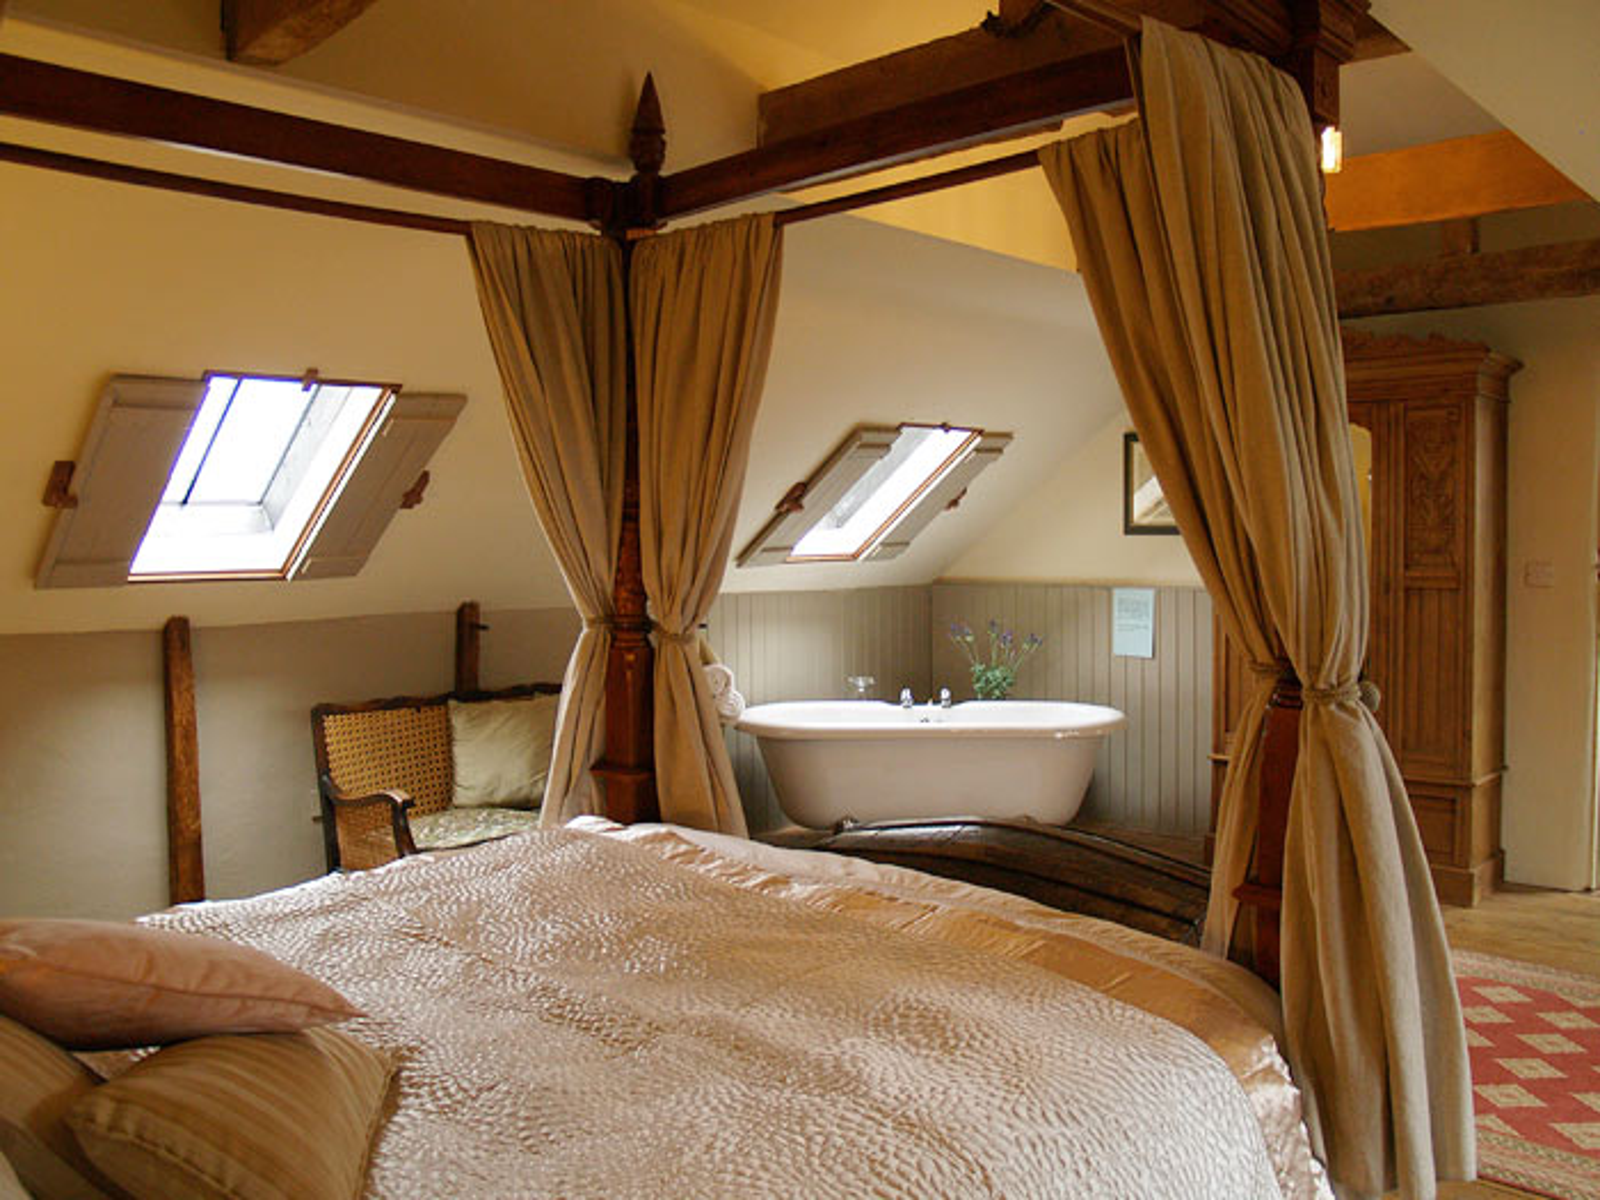 Bath In Bedroom. Cysgodycoed.